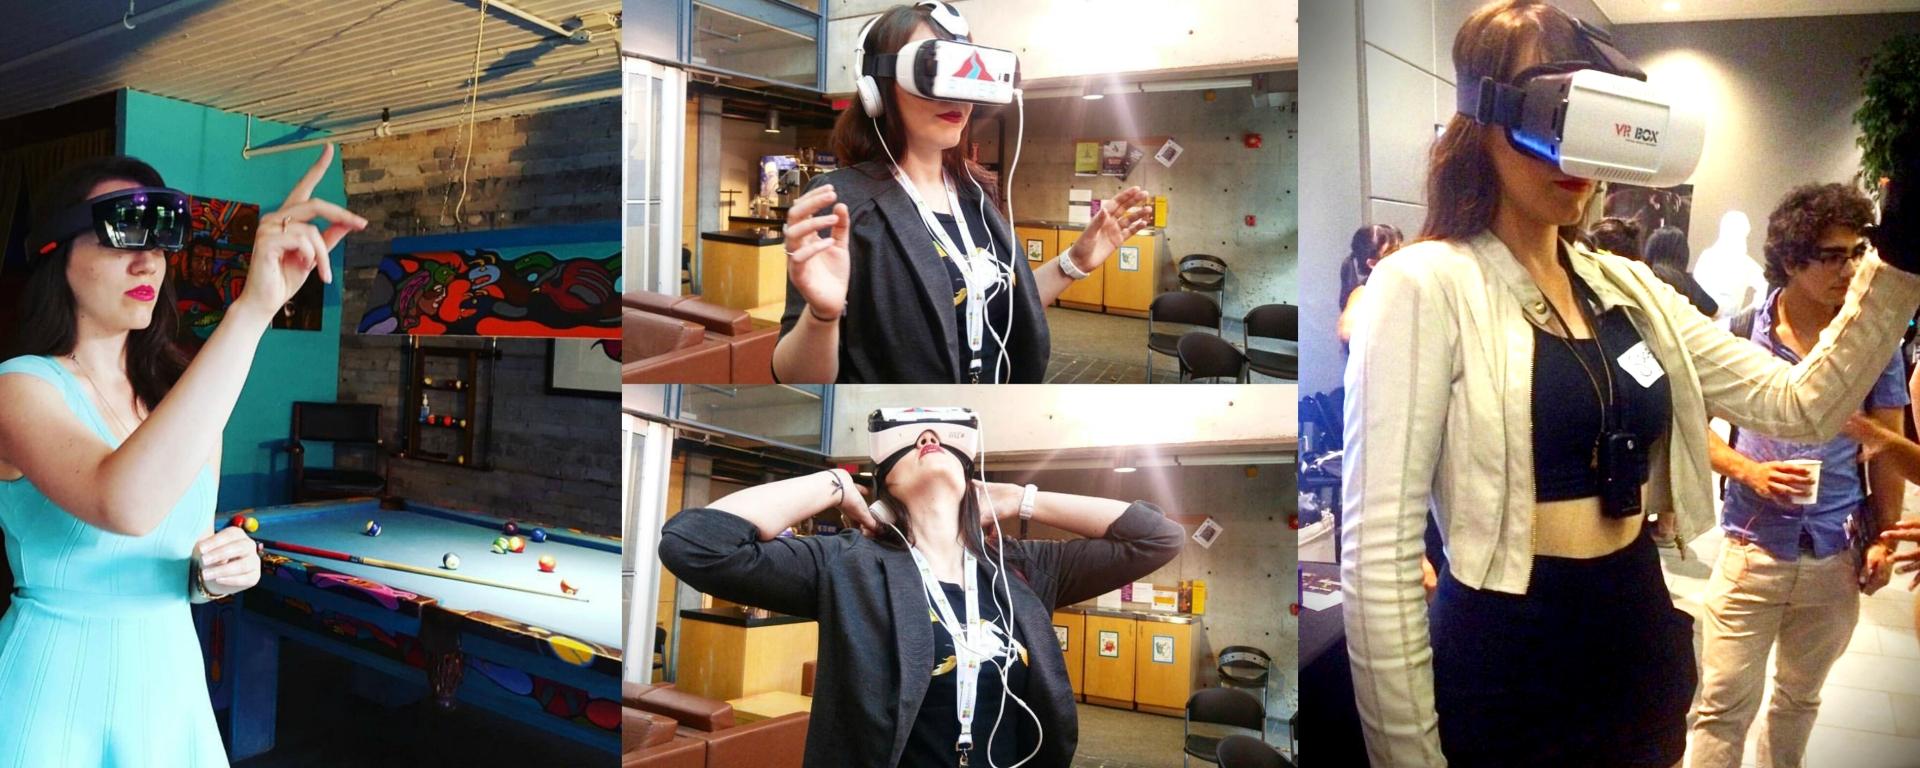 808421abddf Virtual Reality vs. Augmented Reality